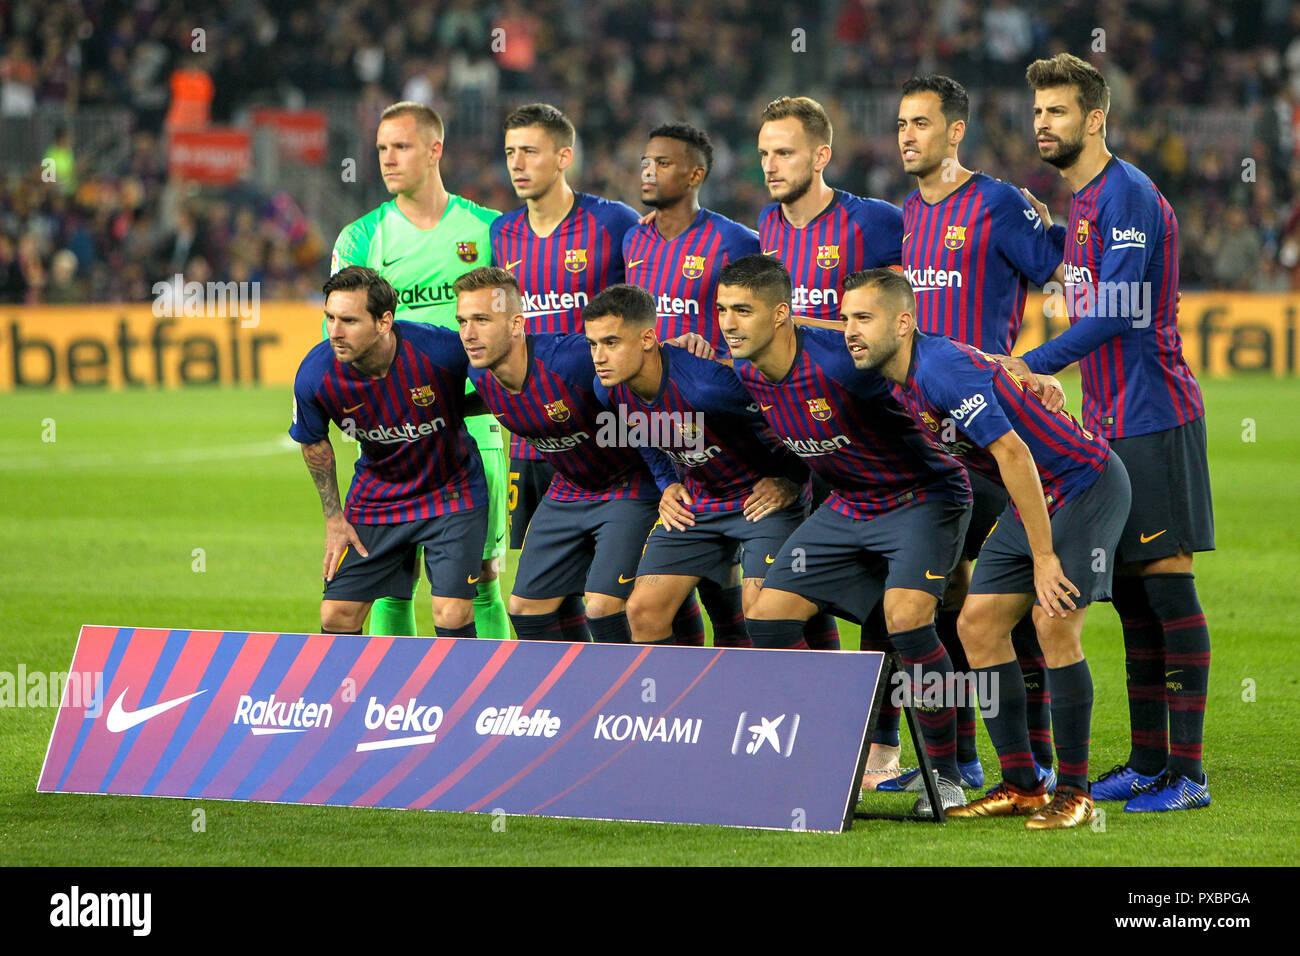 Camp Nou Barcelona Spain 20th Oct 2018 La Liga Football Barcelona Versus Sevilla Fc Barcelona Team Line Up Credit Action Plus Sports Alamy Live News Stock Photo Alamy